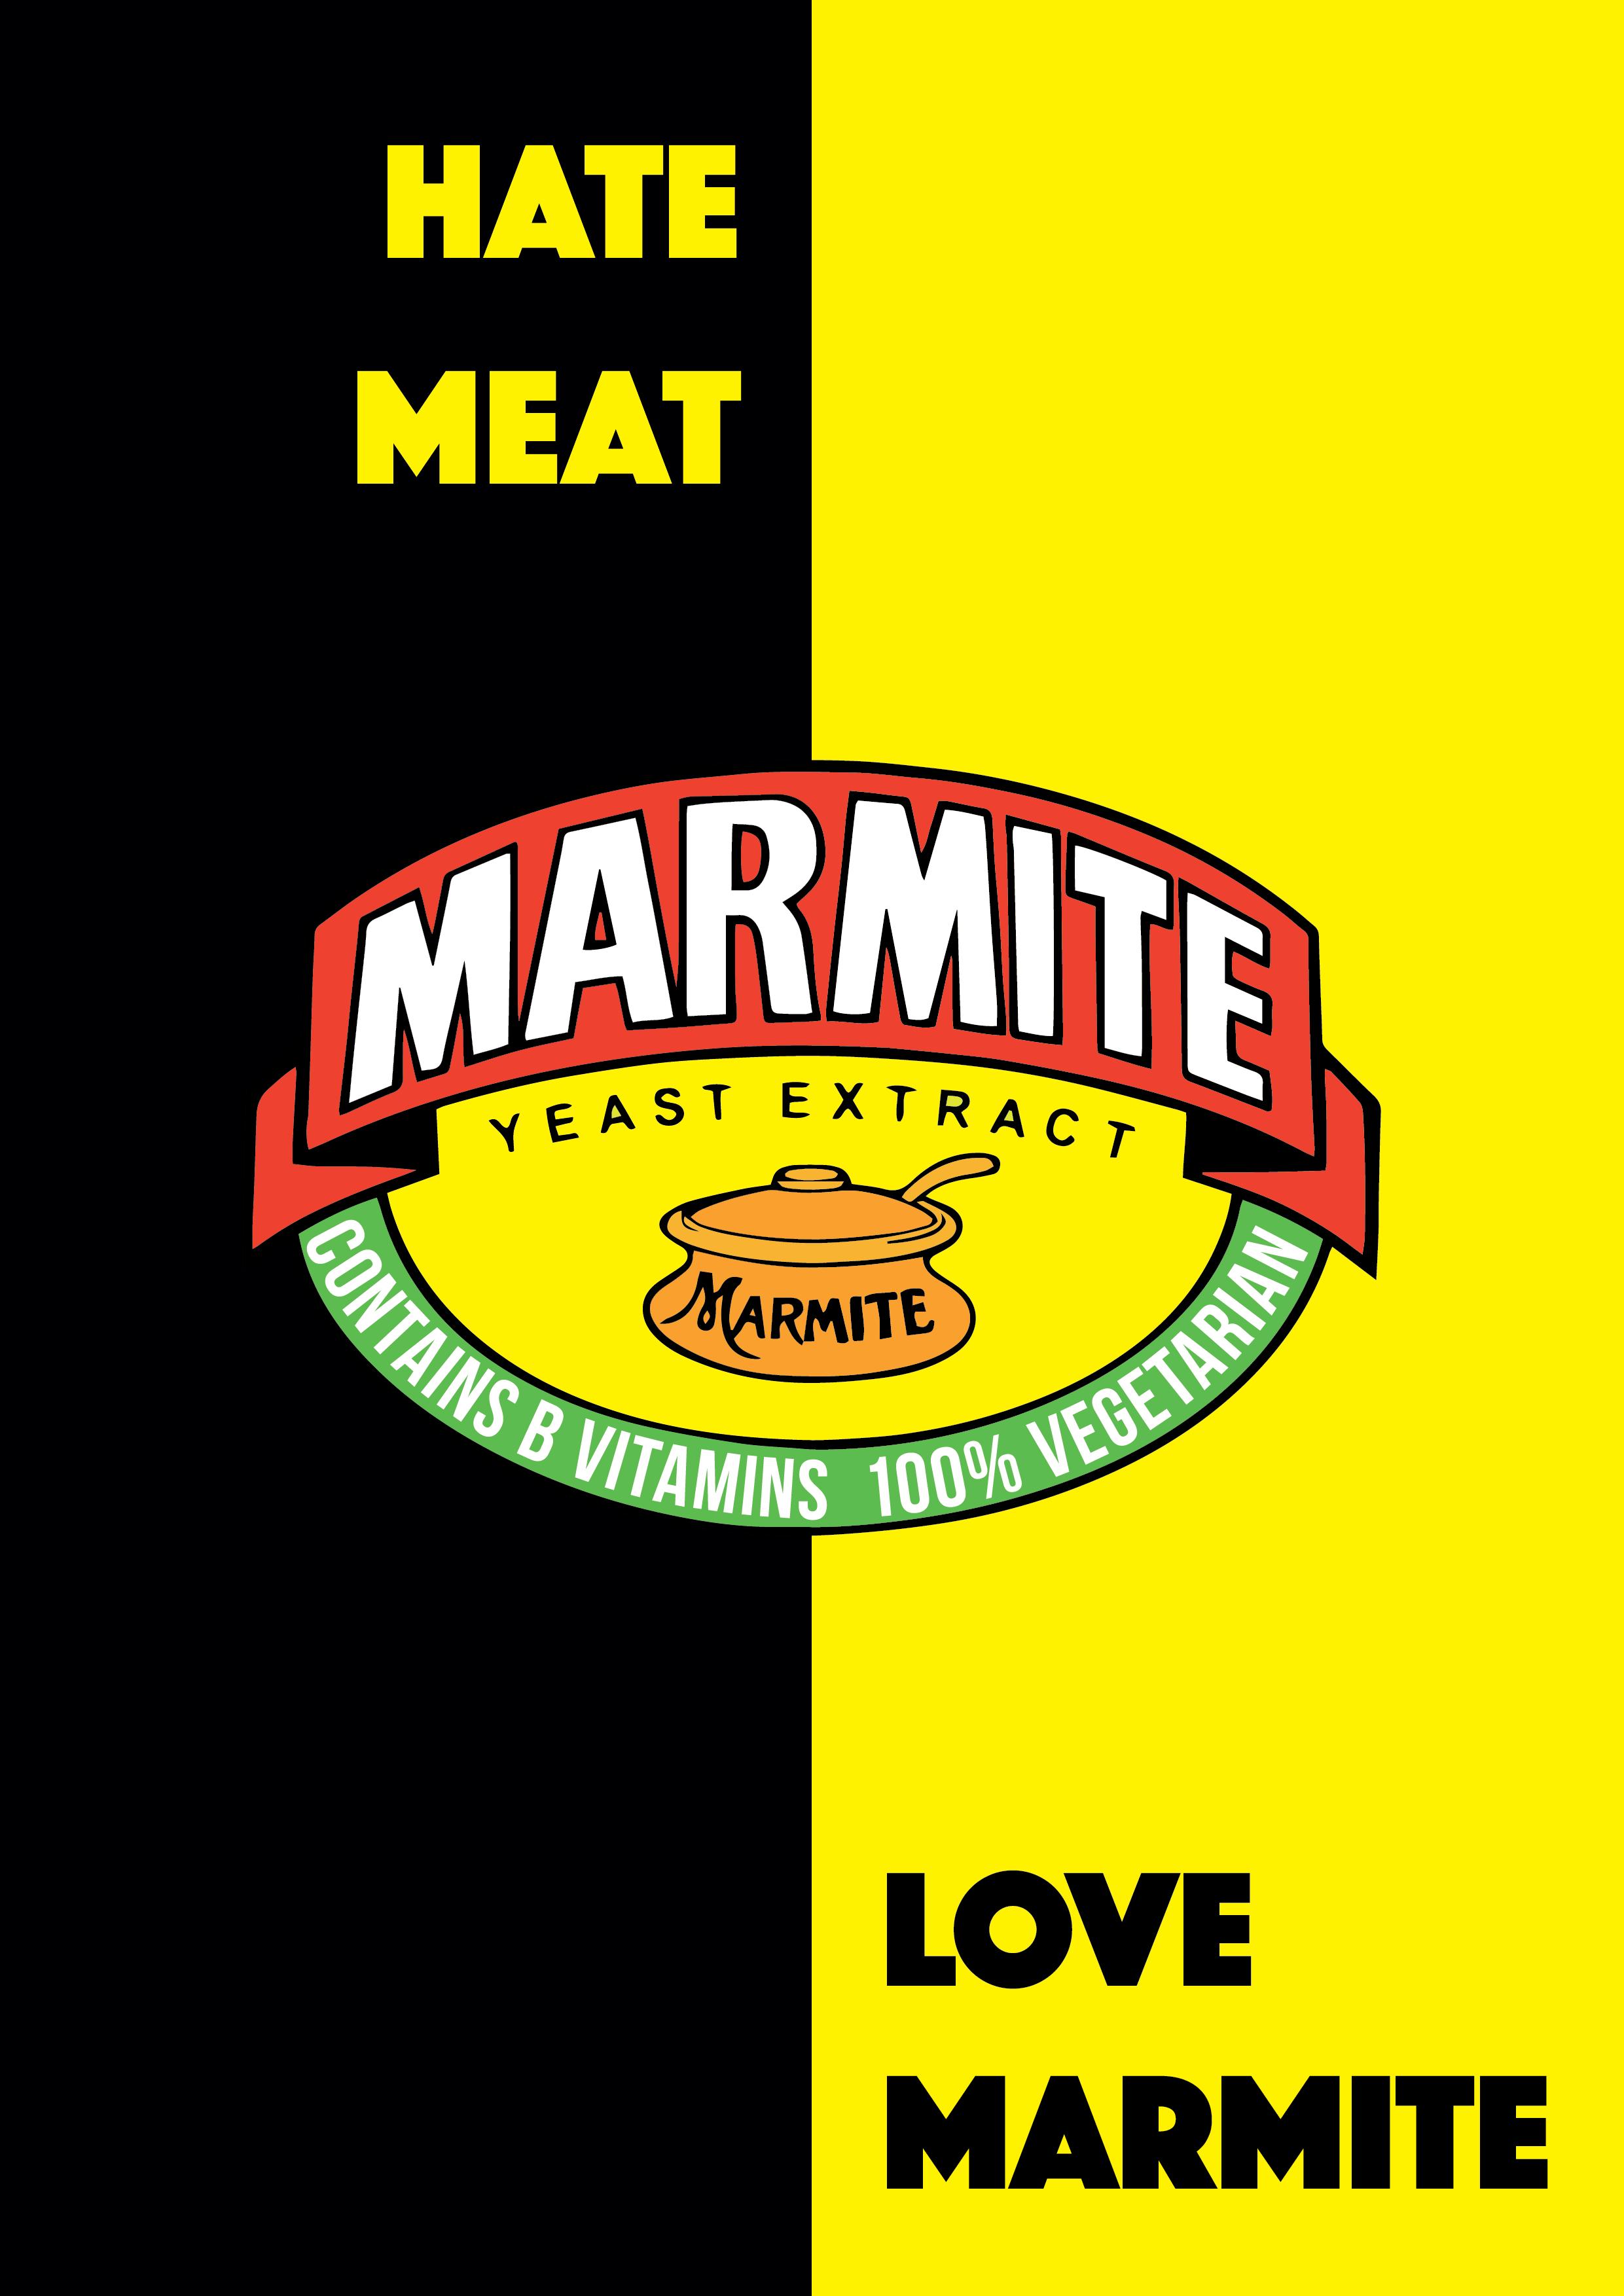 Marmate-04.png